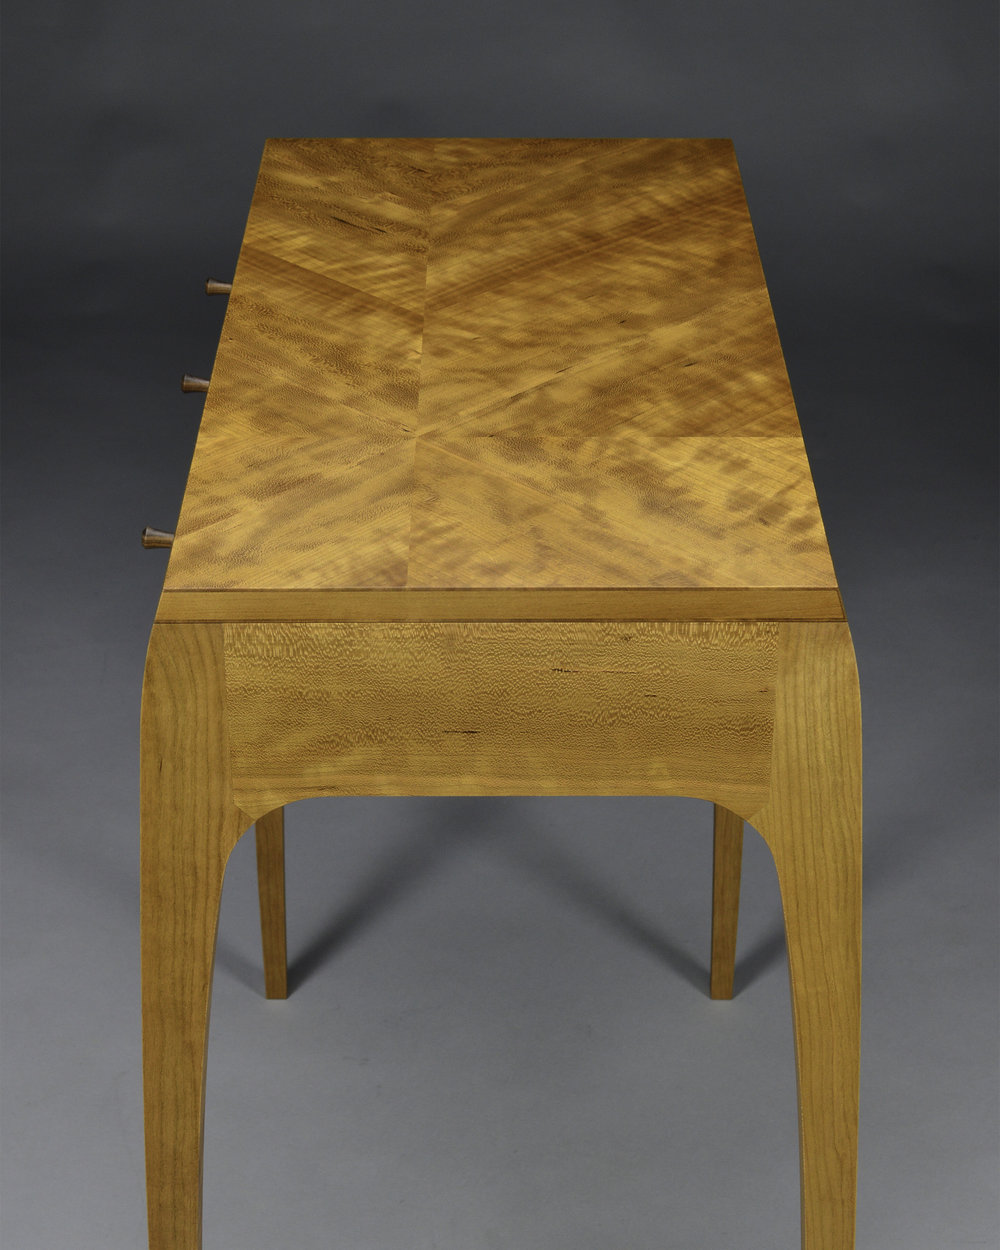 luxury furniture side table.jpg